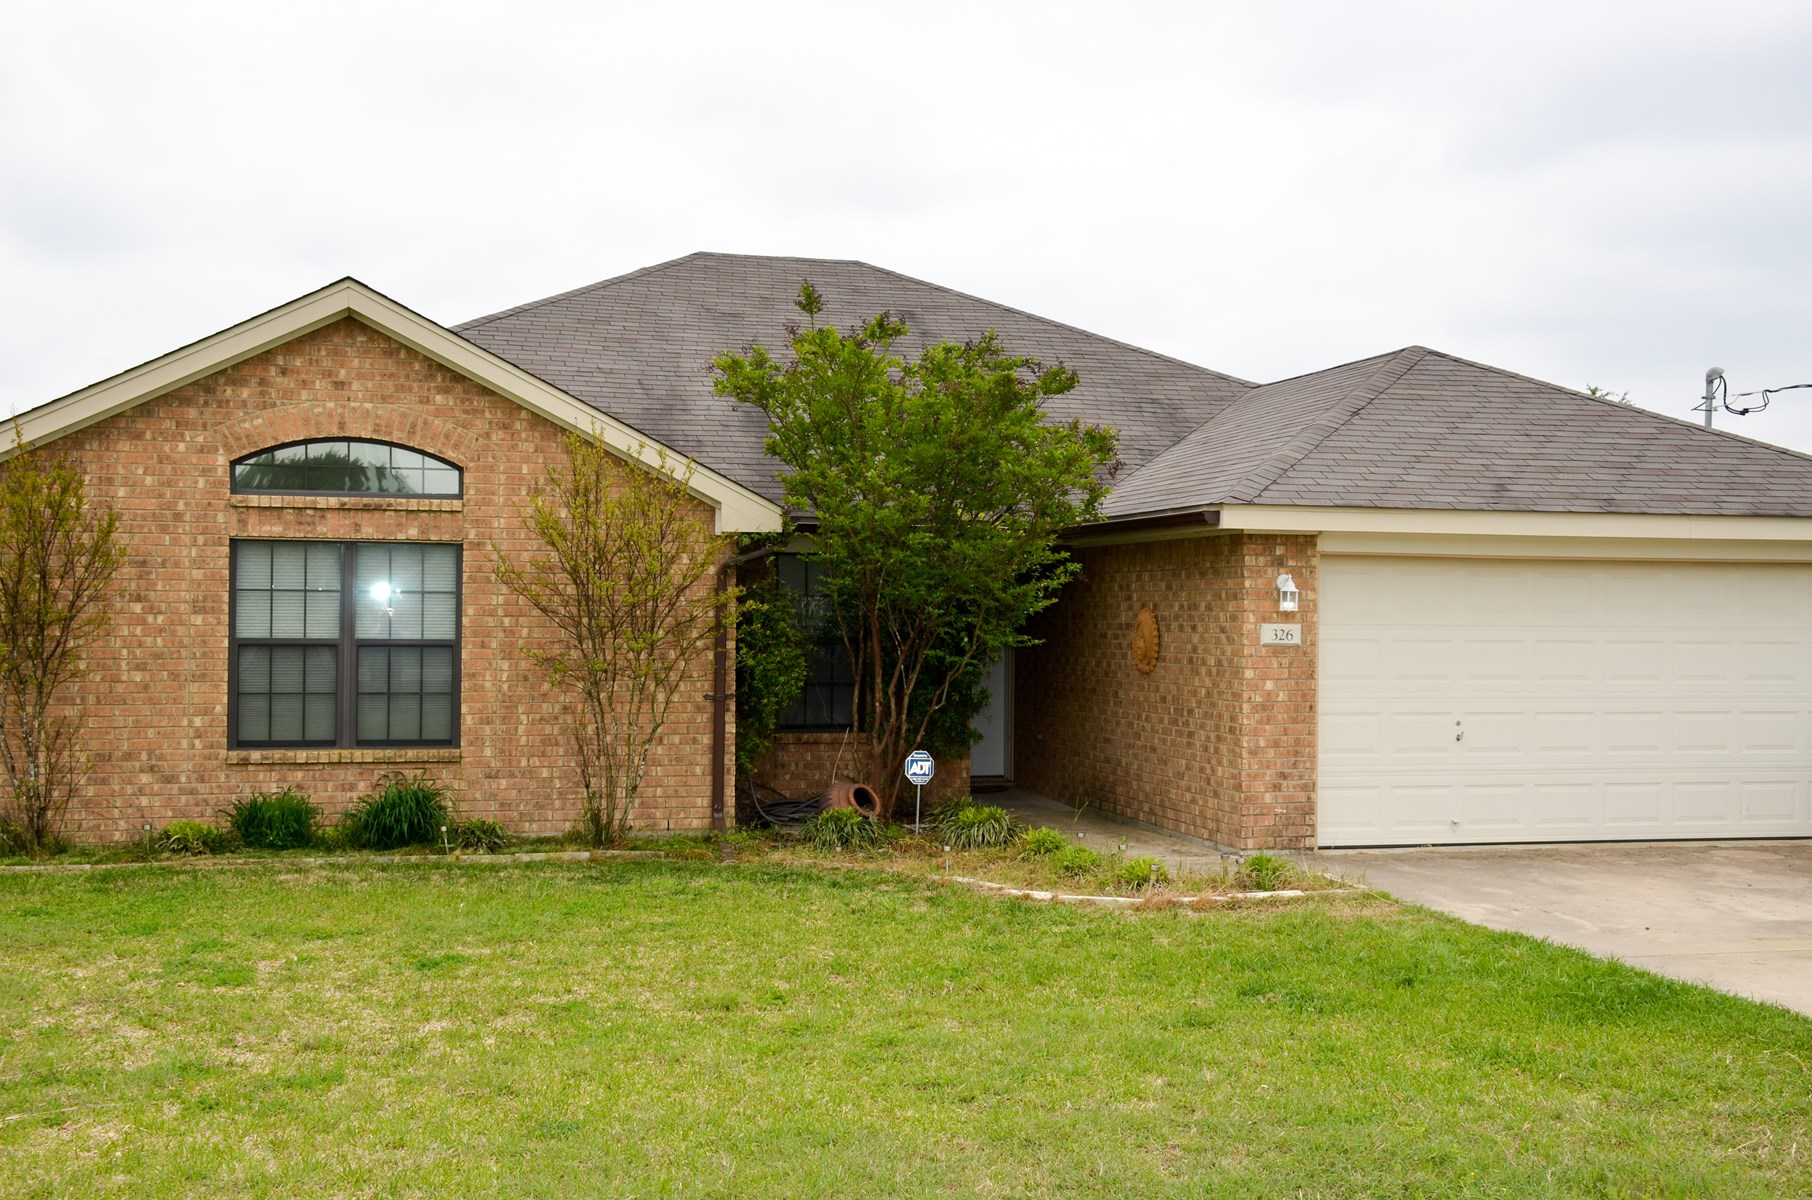 4 Bedroom 2 Bath Home For Sale Kempner TX, Live Oak Estates